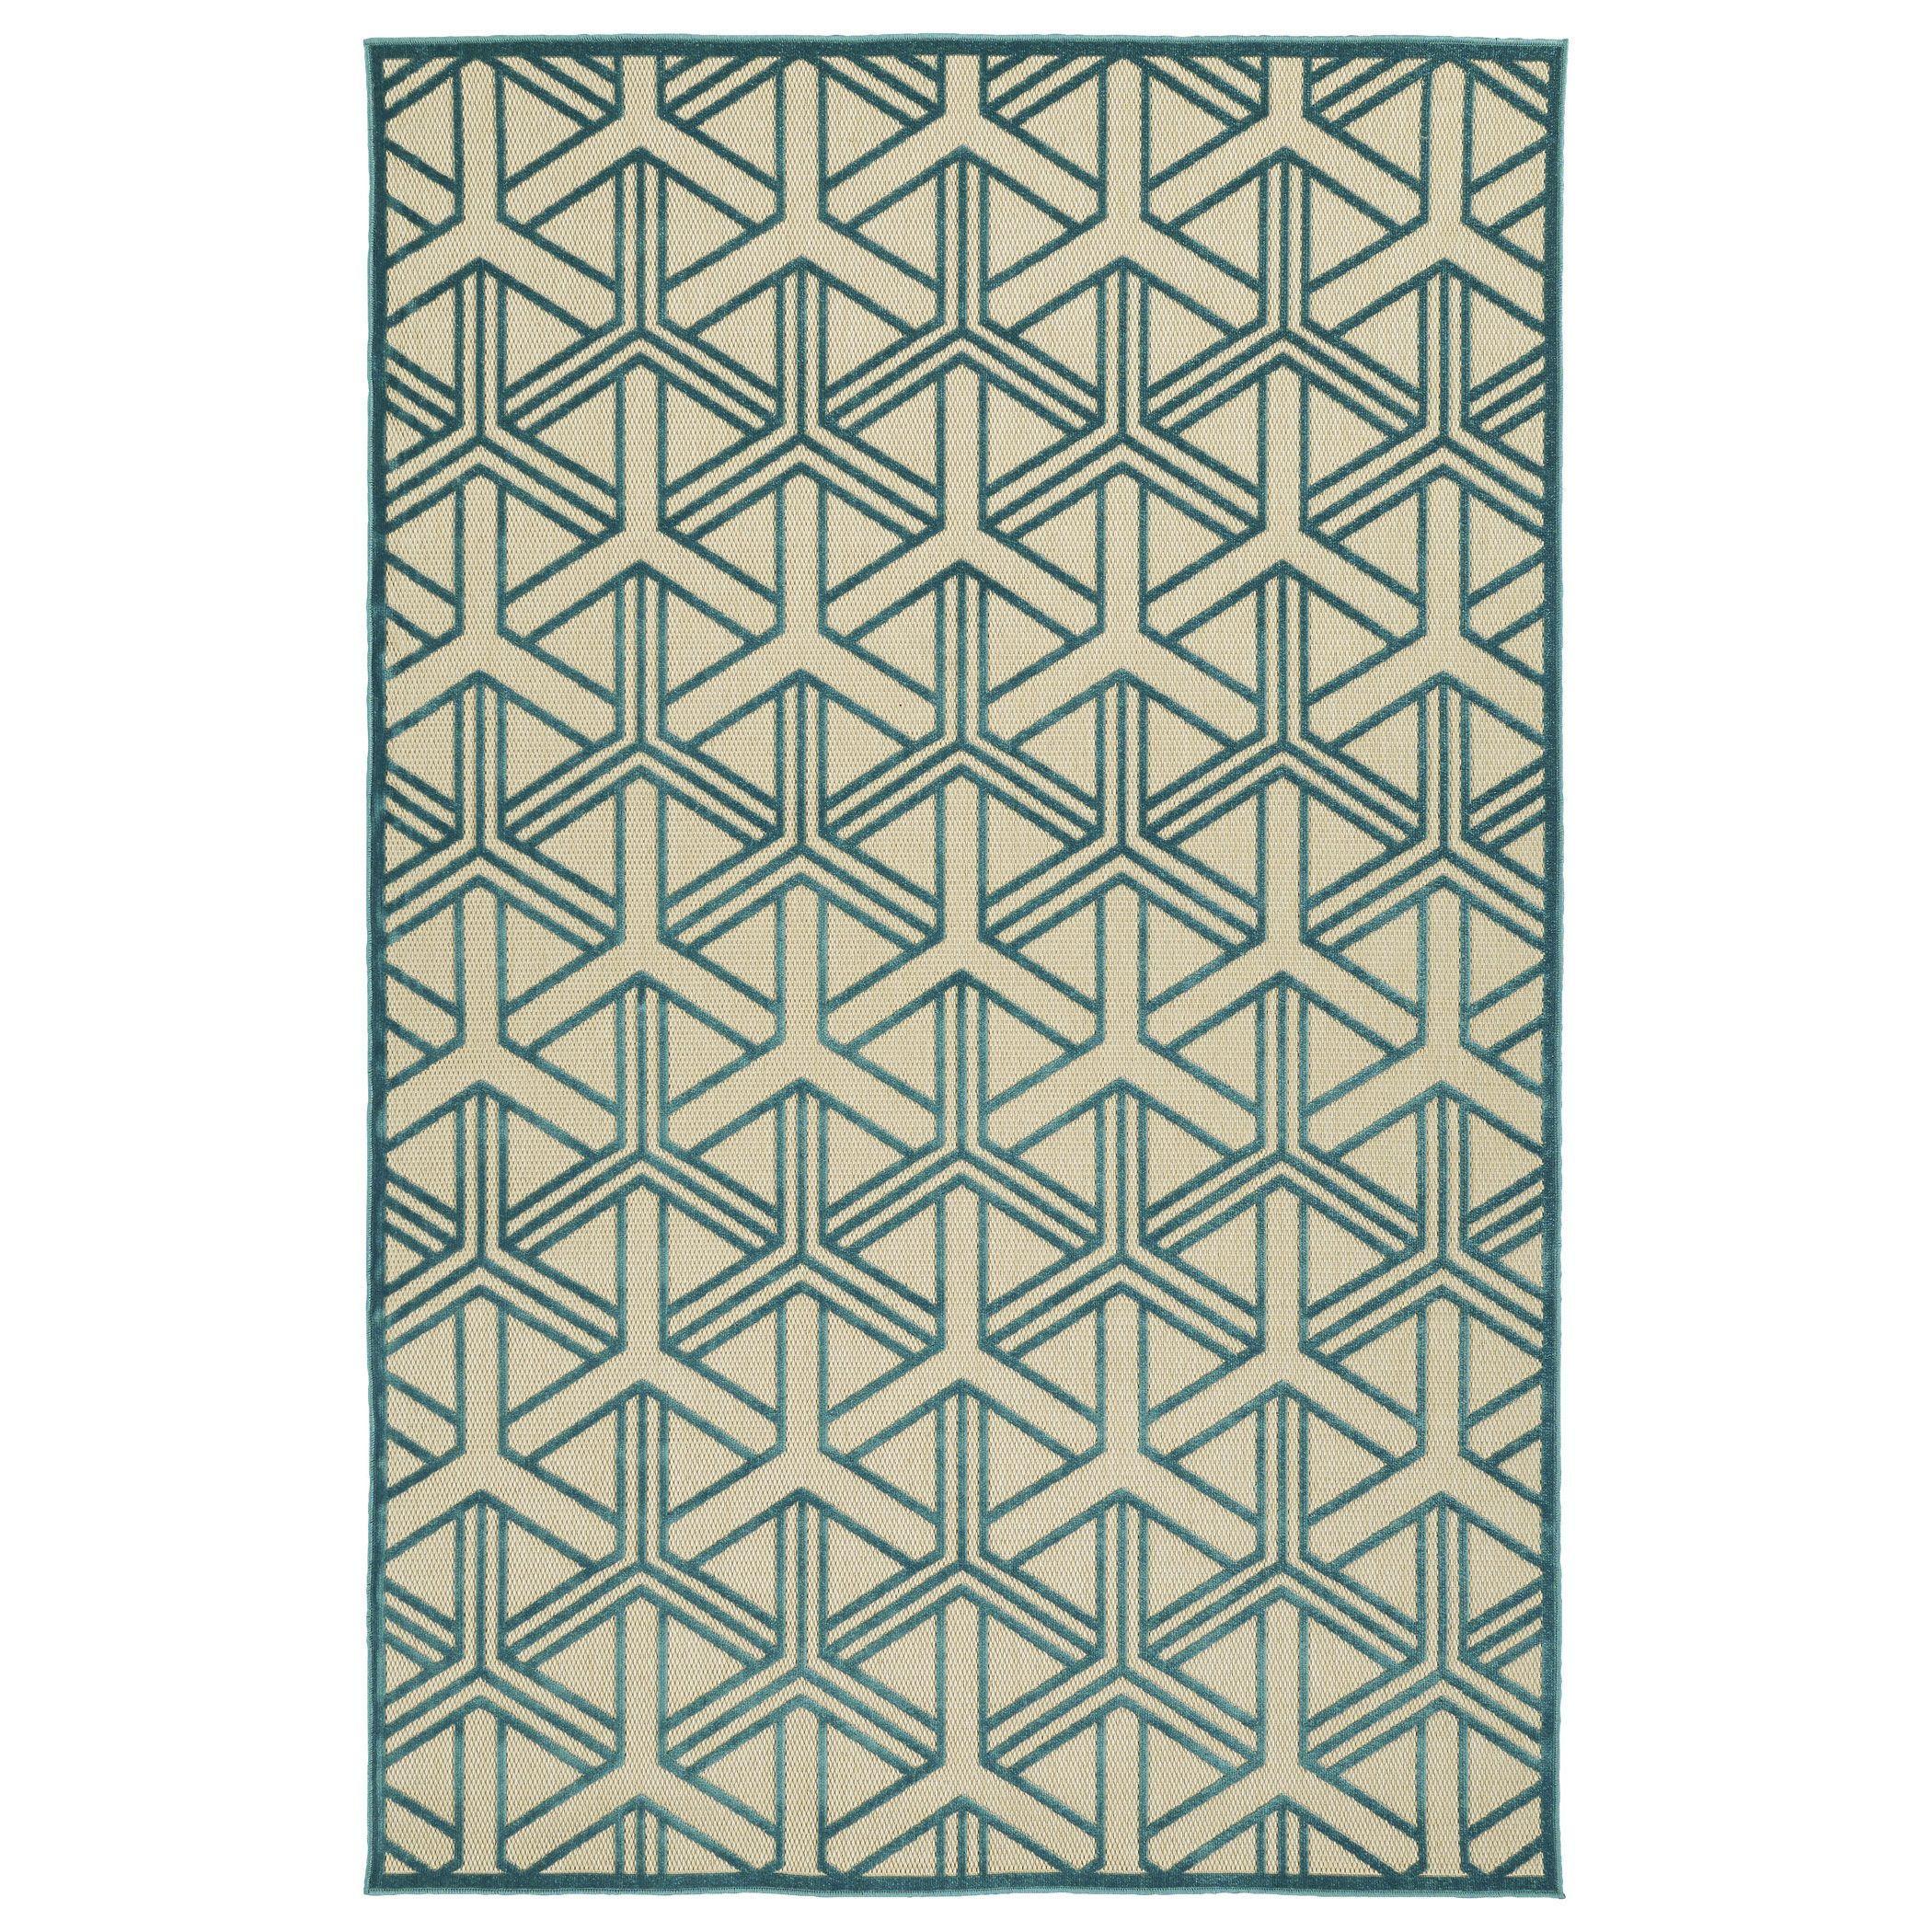 Kaleen rugs indooroutdoor luka blue dimensions rug u x u